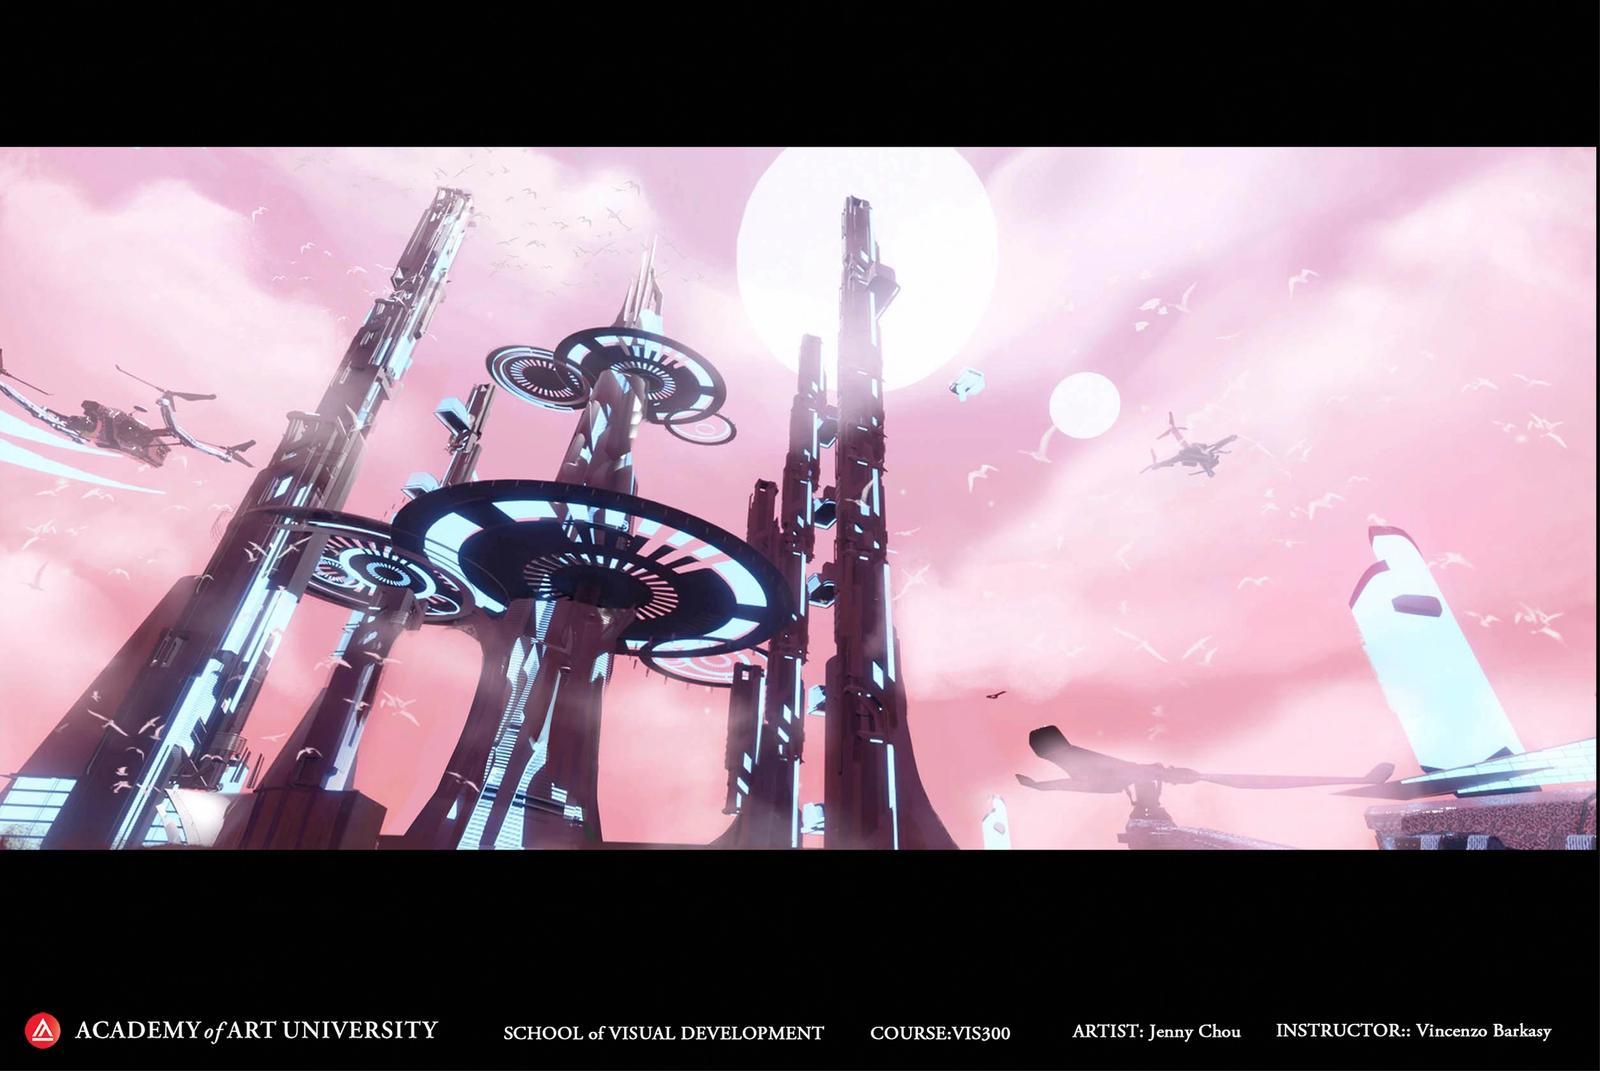 Utopia- Nolo Robot Company (Pinky Sky)